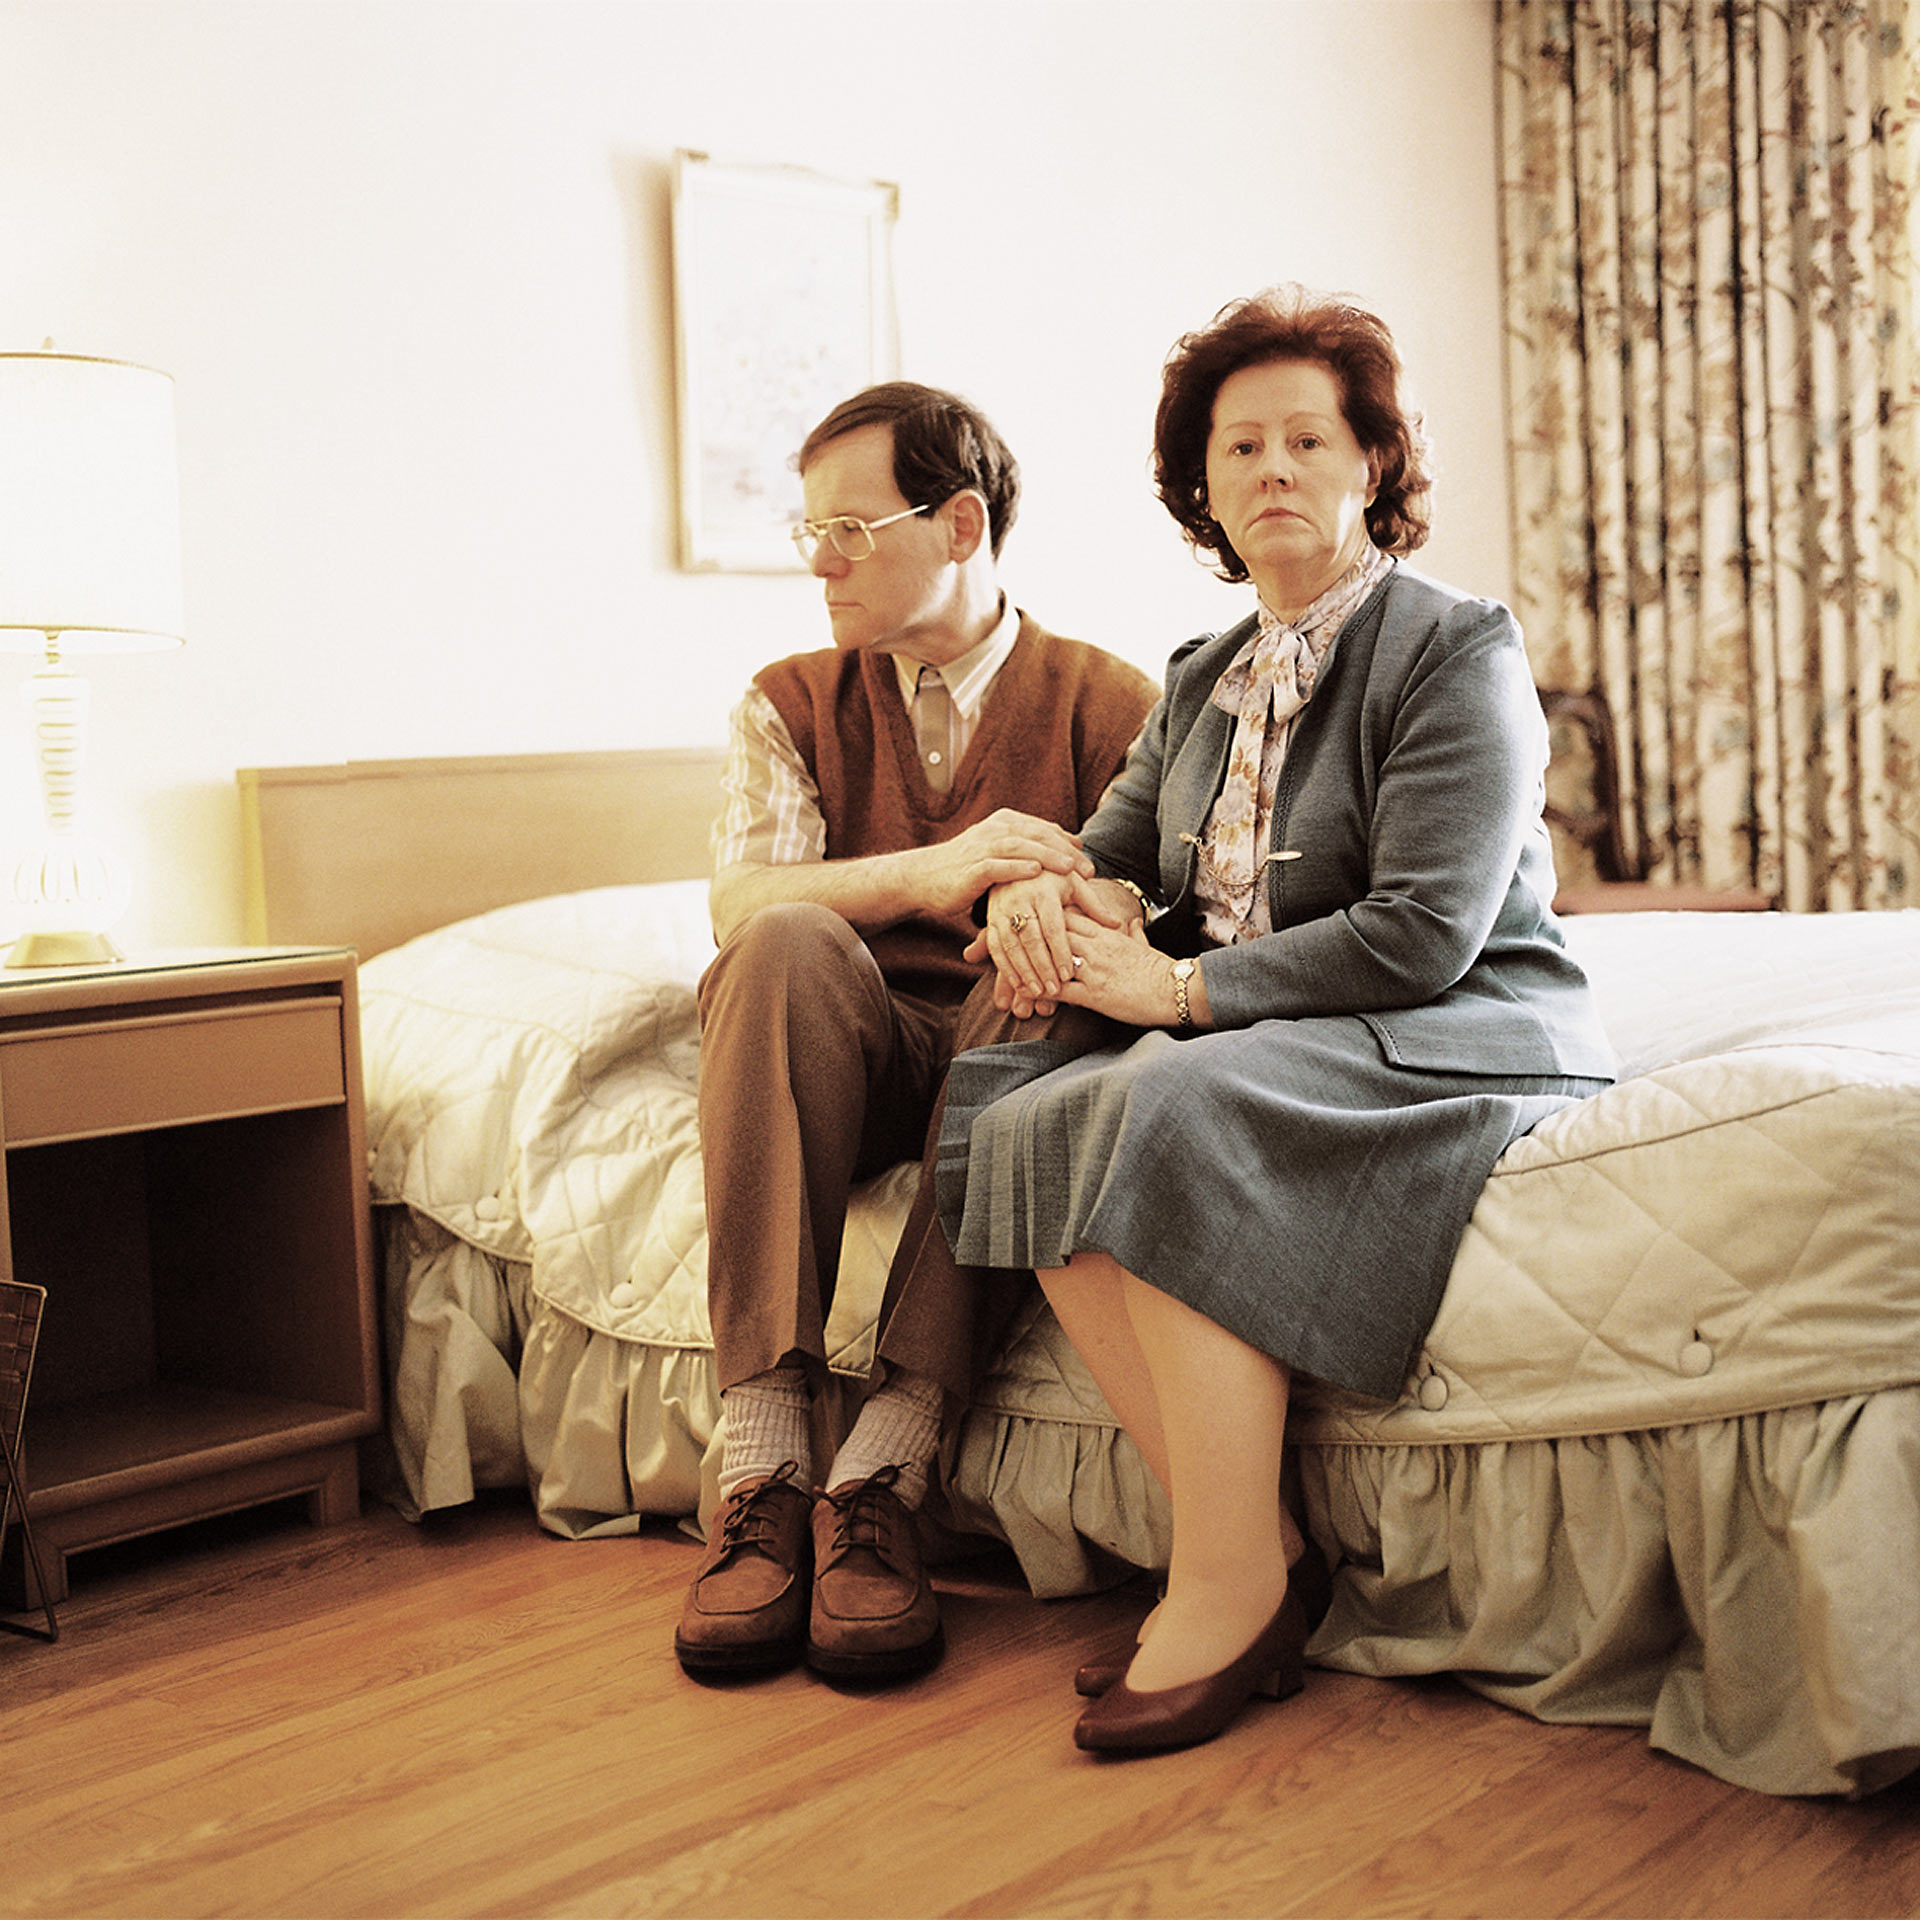 TomFeiler_CRIA_Couple-on-bed.jpg